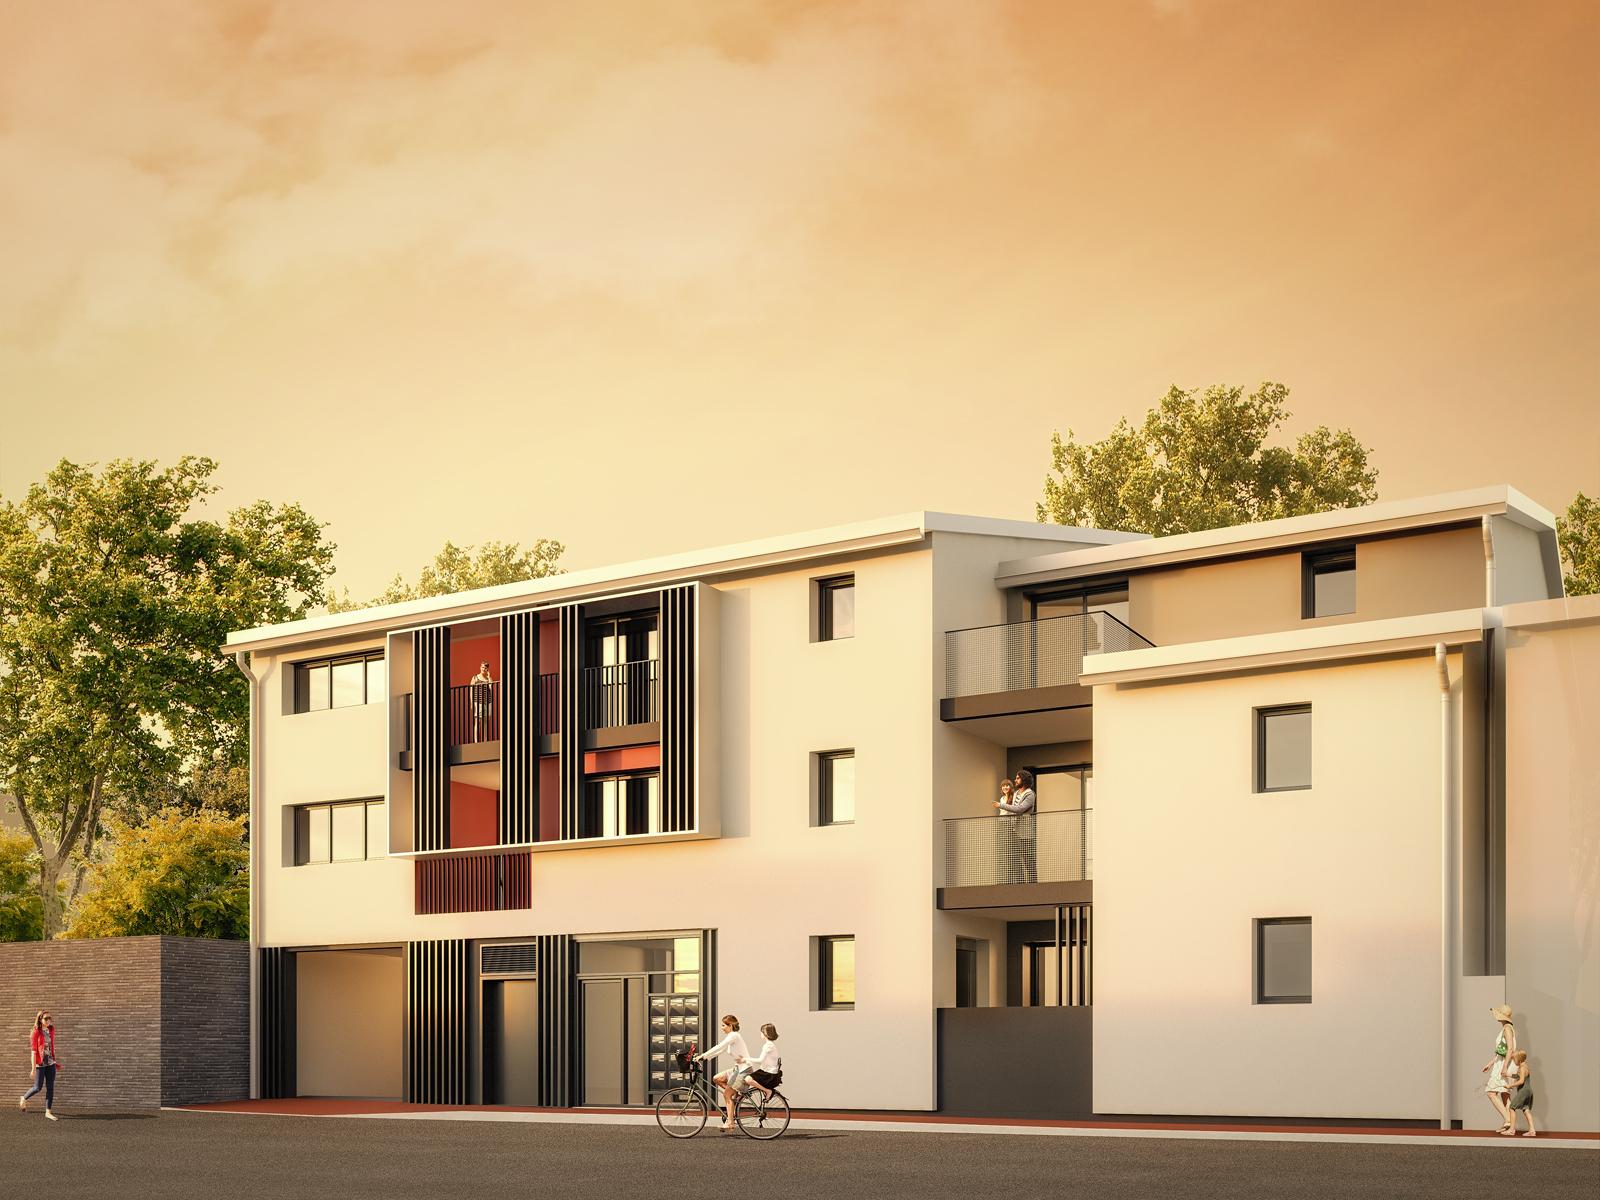 13 appartements en plein coeur de Boutonnet